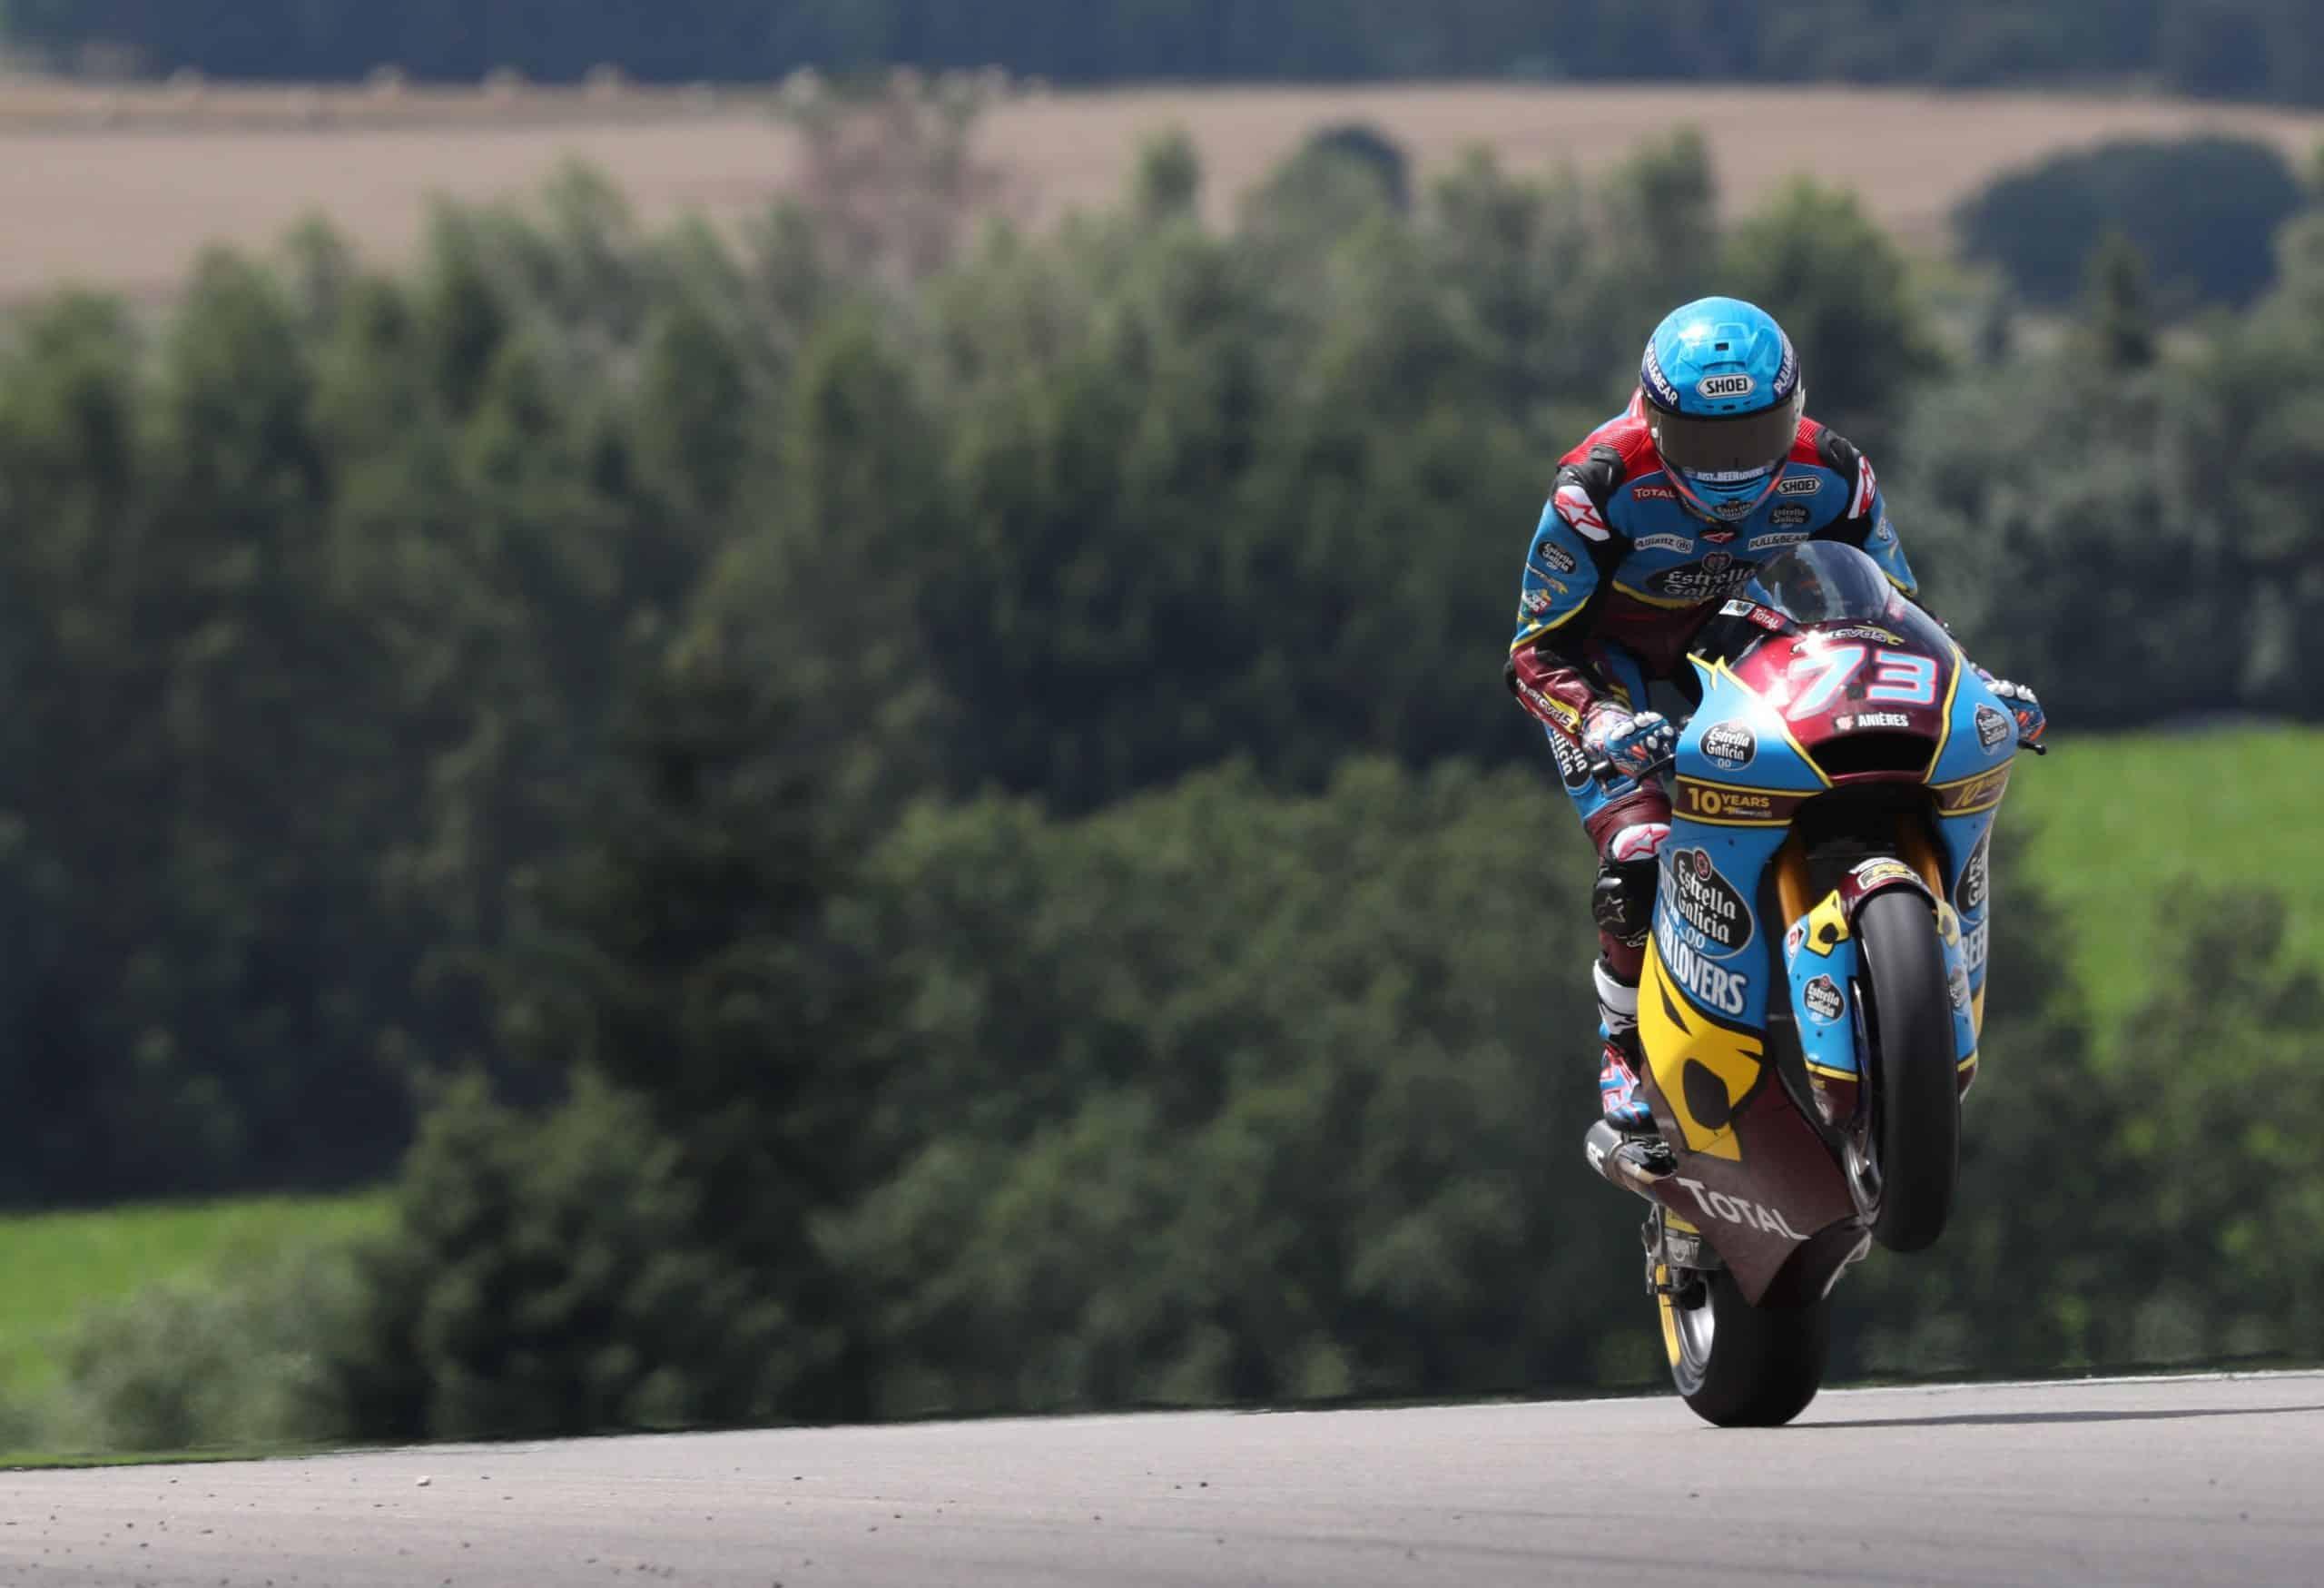 Alex Marquez MotoGP - Photo Credit: Marc VDS Racing Team